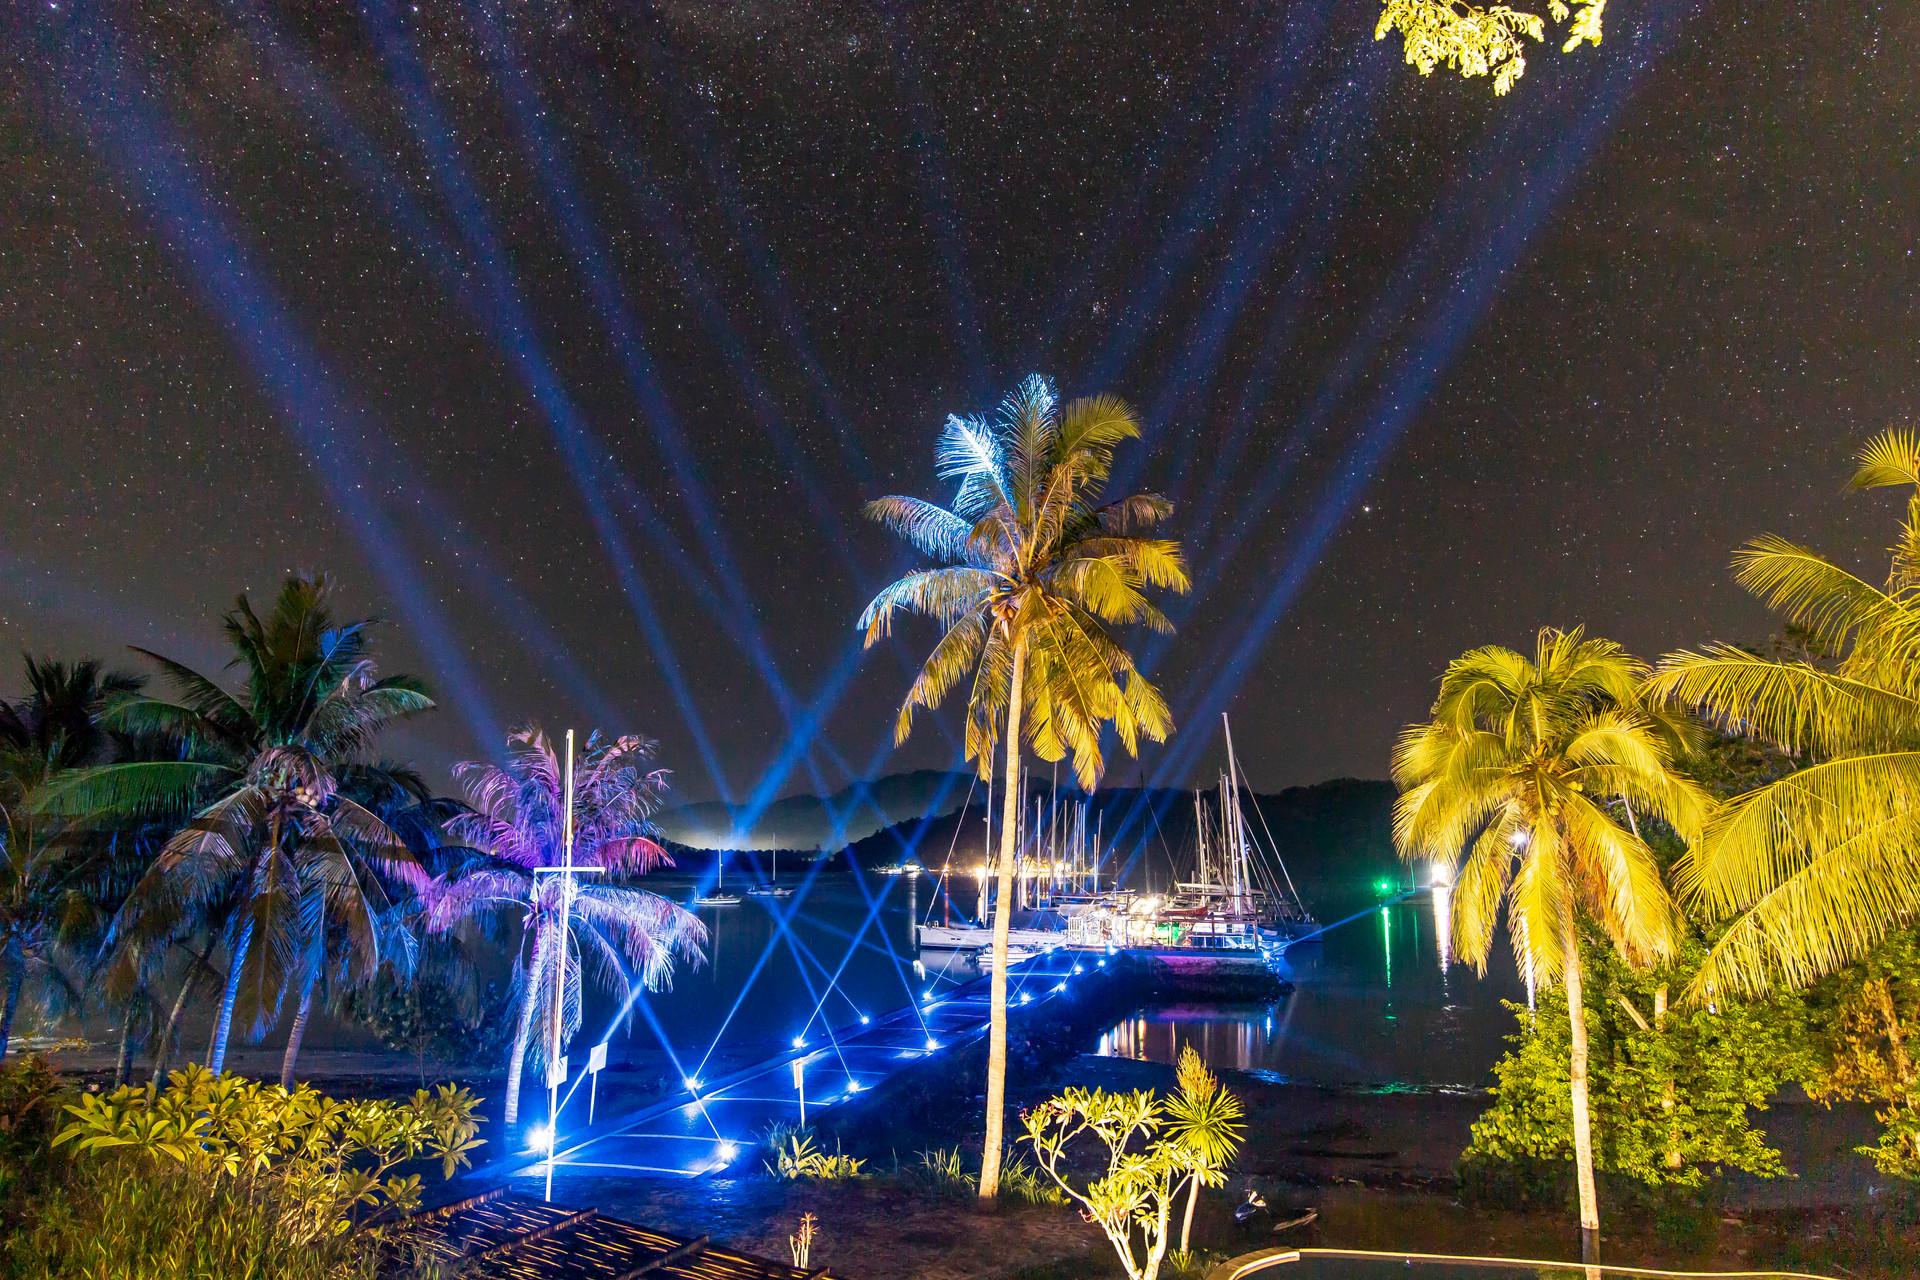 Marina Del Ray View at night from the ba